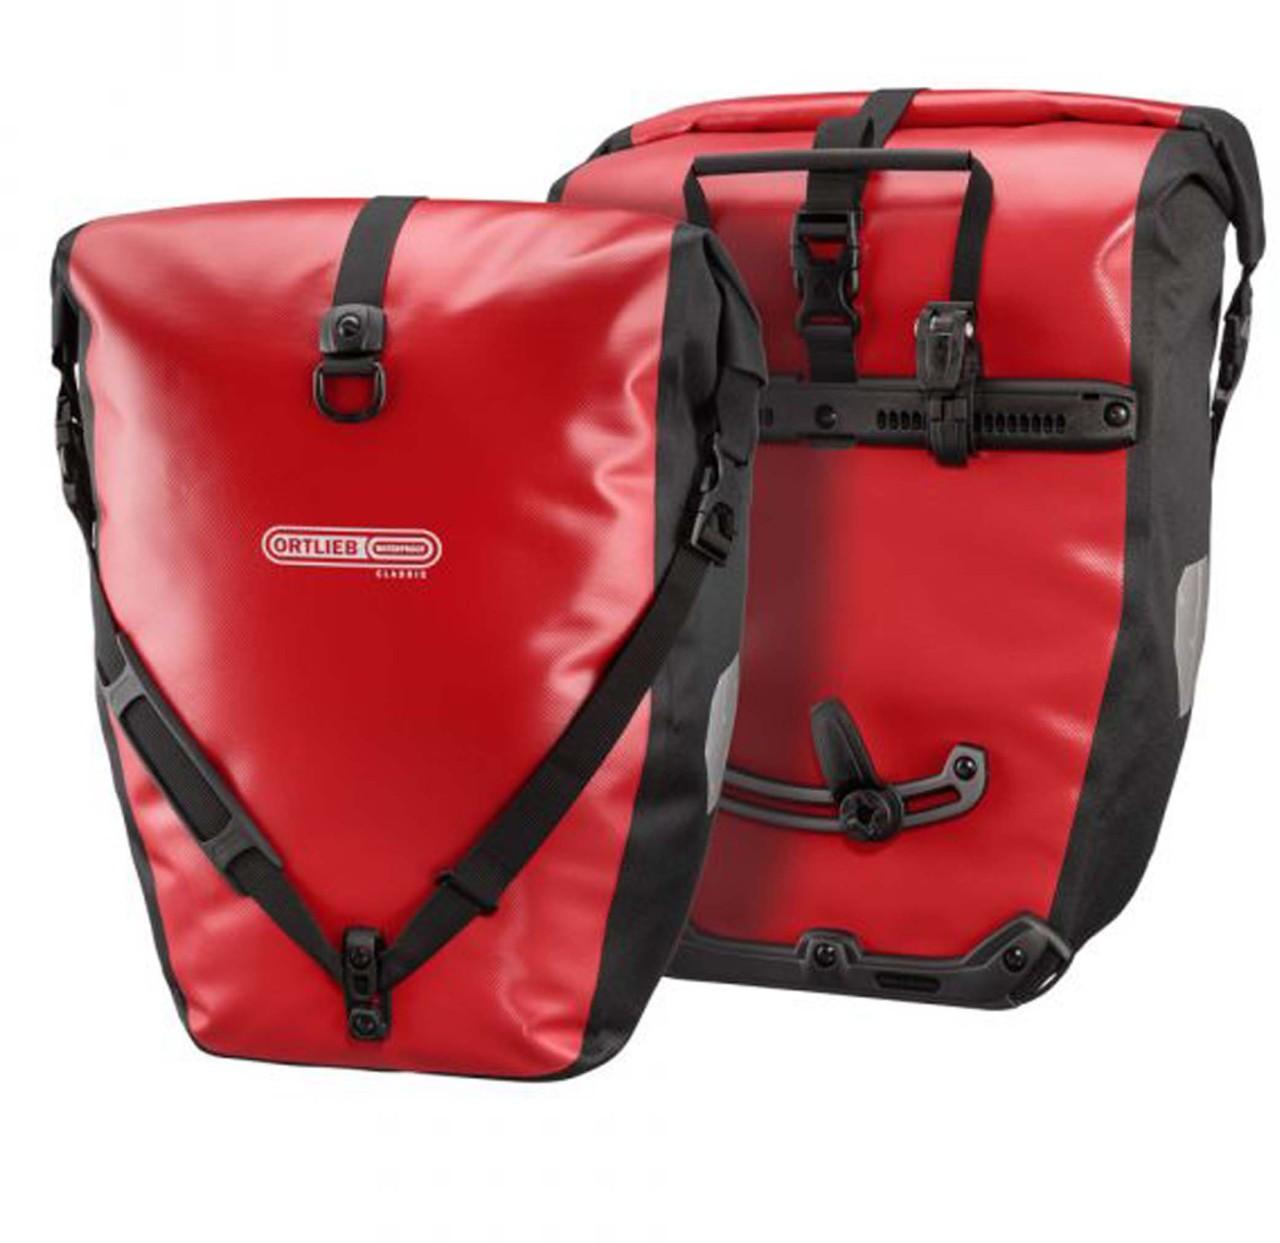 Ortlieb Back-Roller Classic Fahrradtasche, red-black